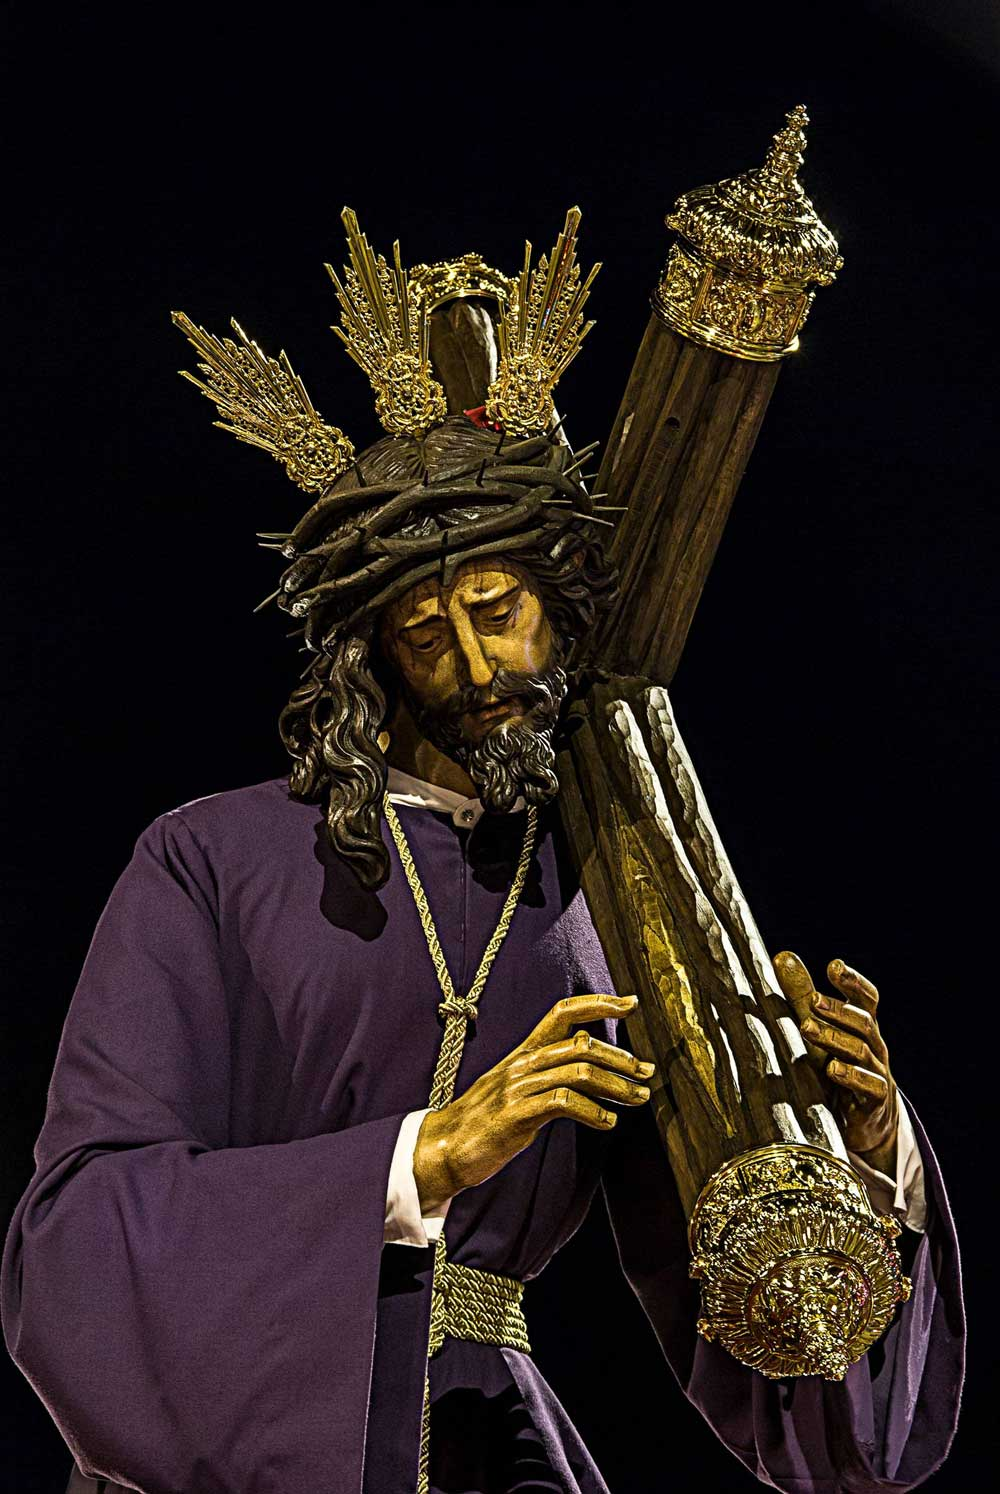 jesus-del-gran-poder-elche-003